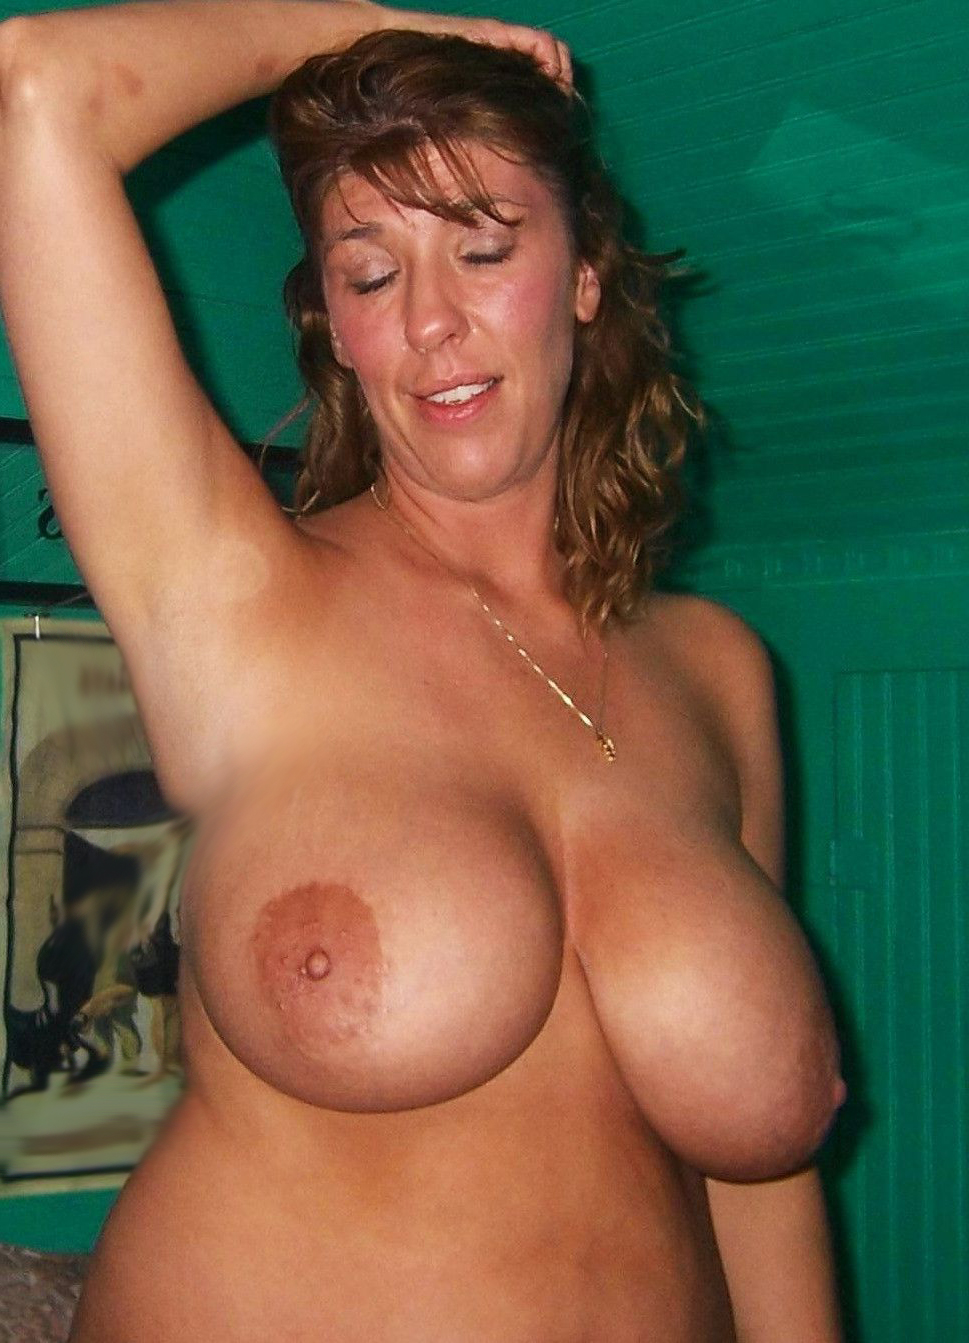 Huge Floppy Mature Tits